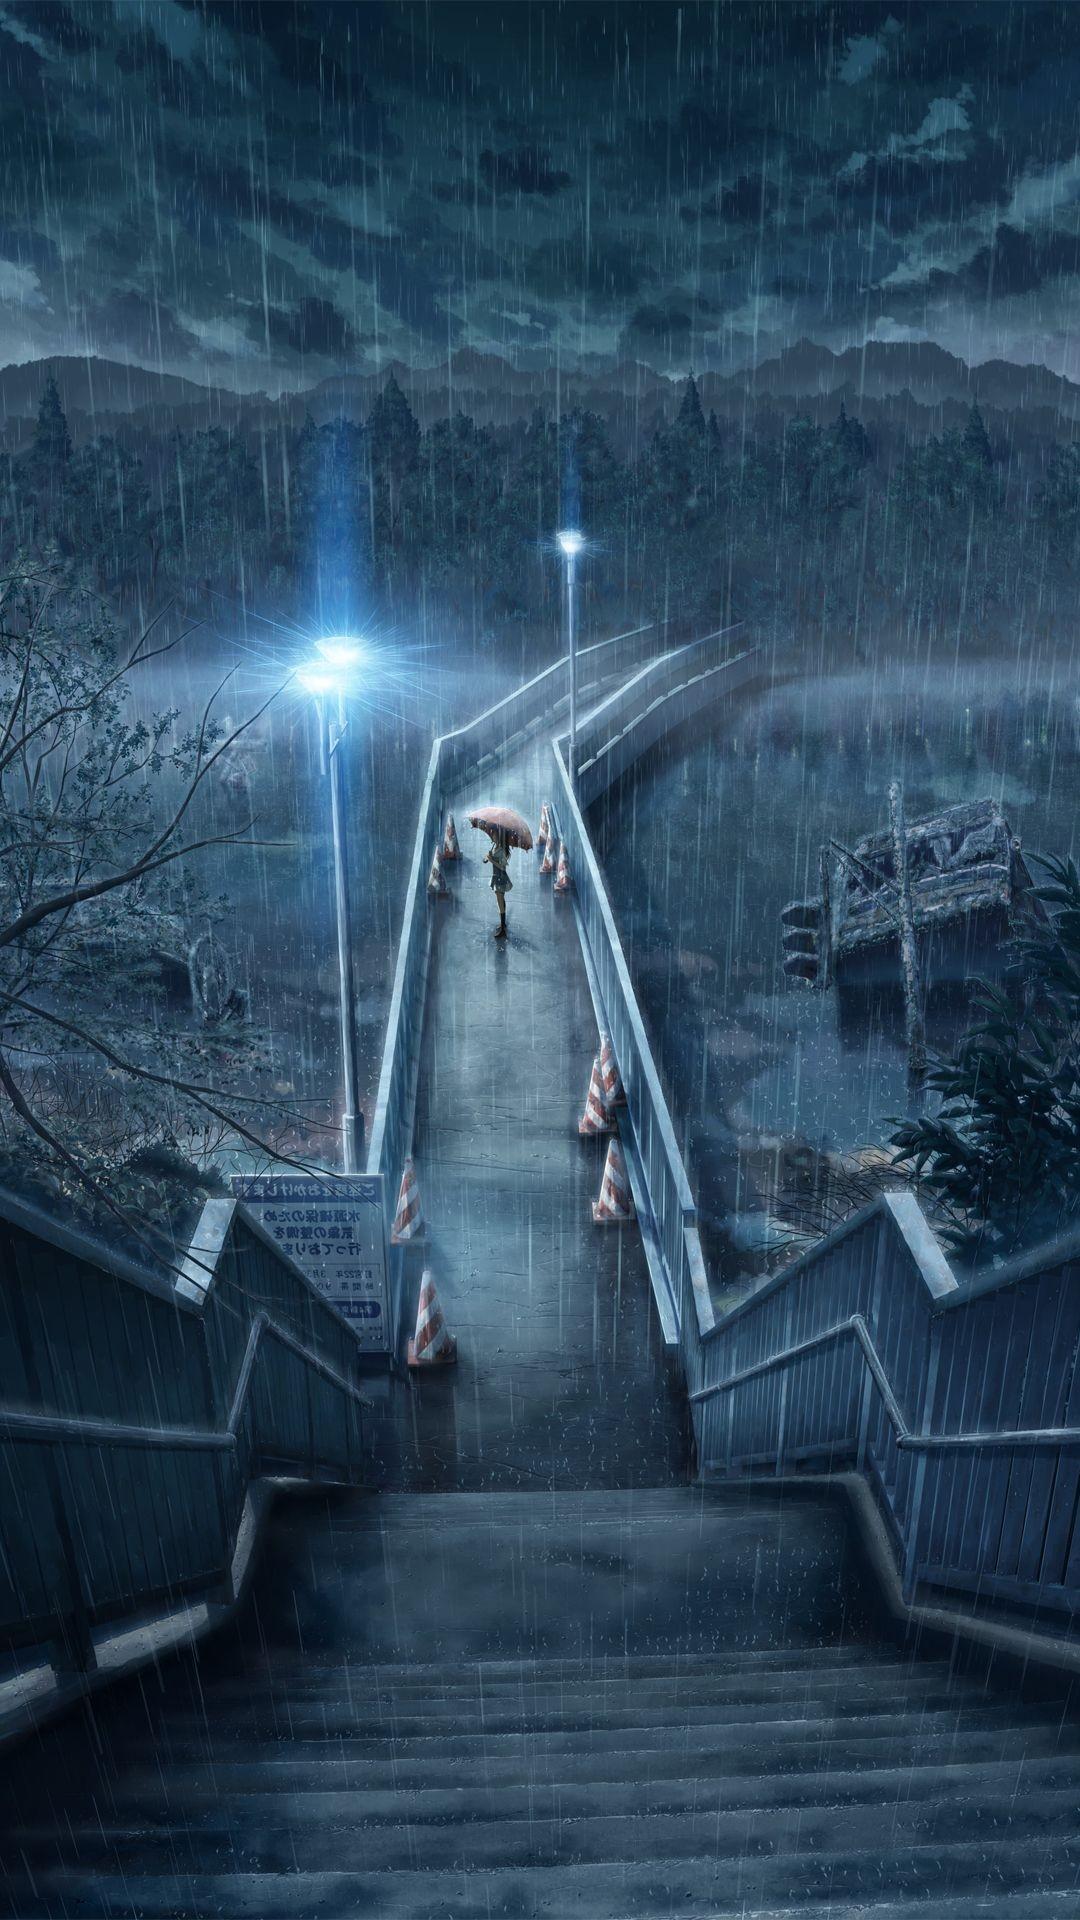 … Rainy night Anime mobile wallpaper